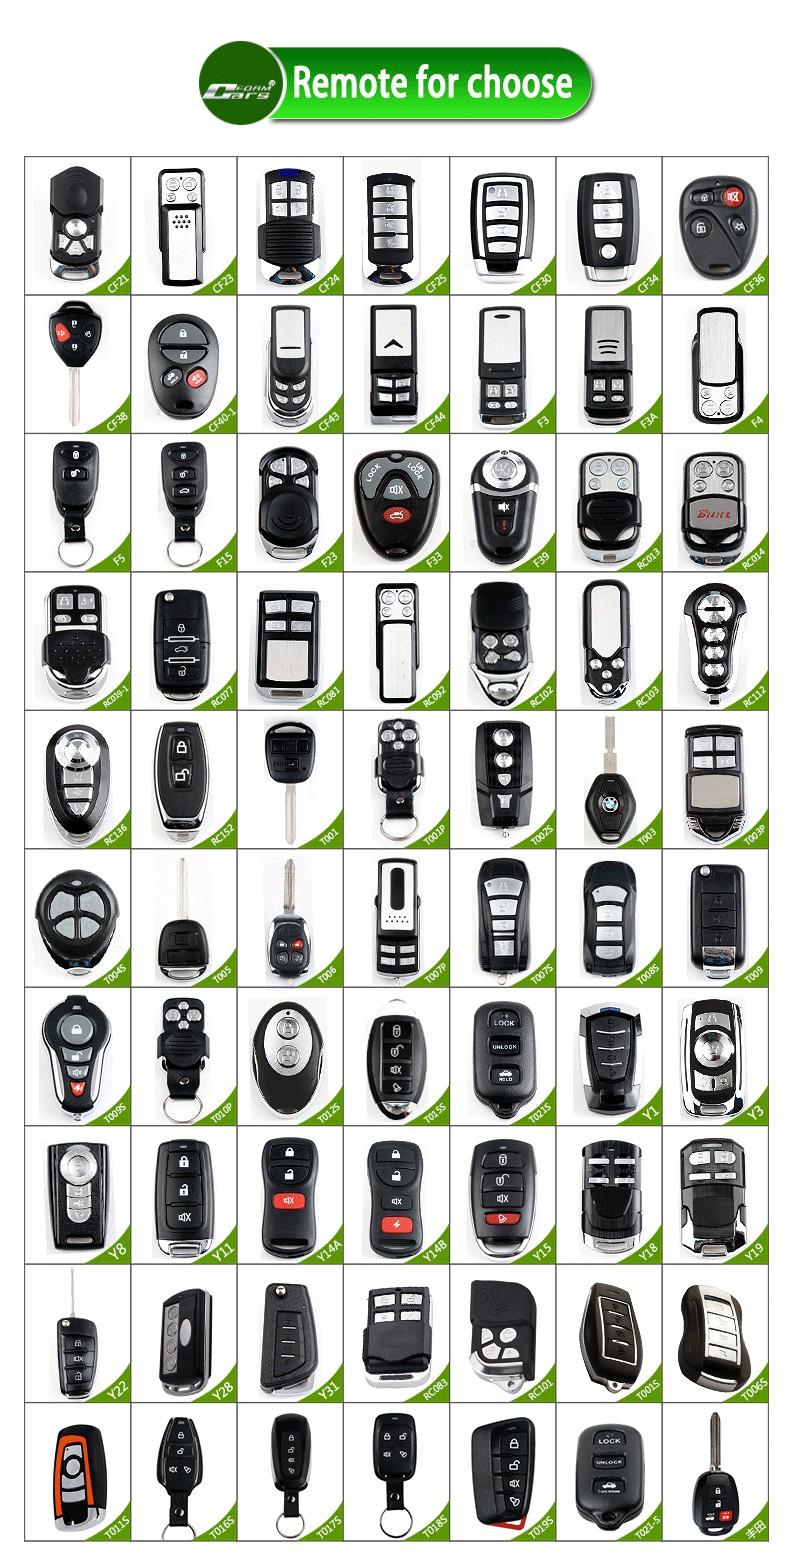 2016 Universal One Way 13 Pin Malaysian Car Alarm System Diy Install Generic Wiring Diagram